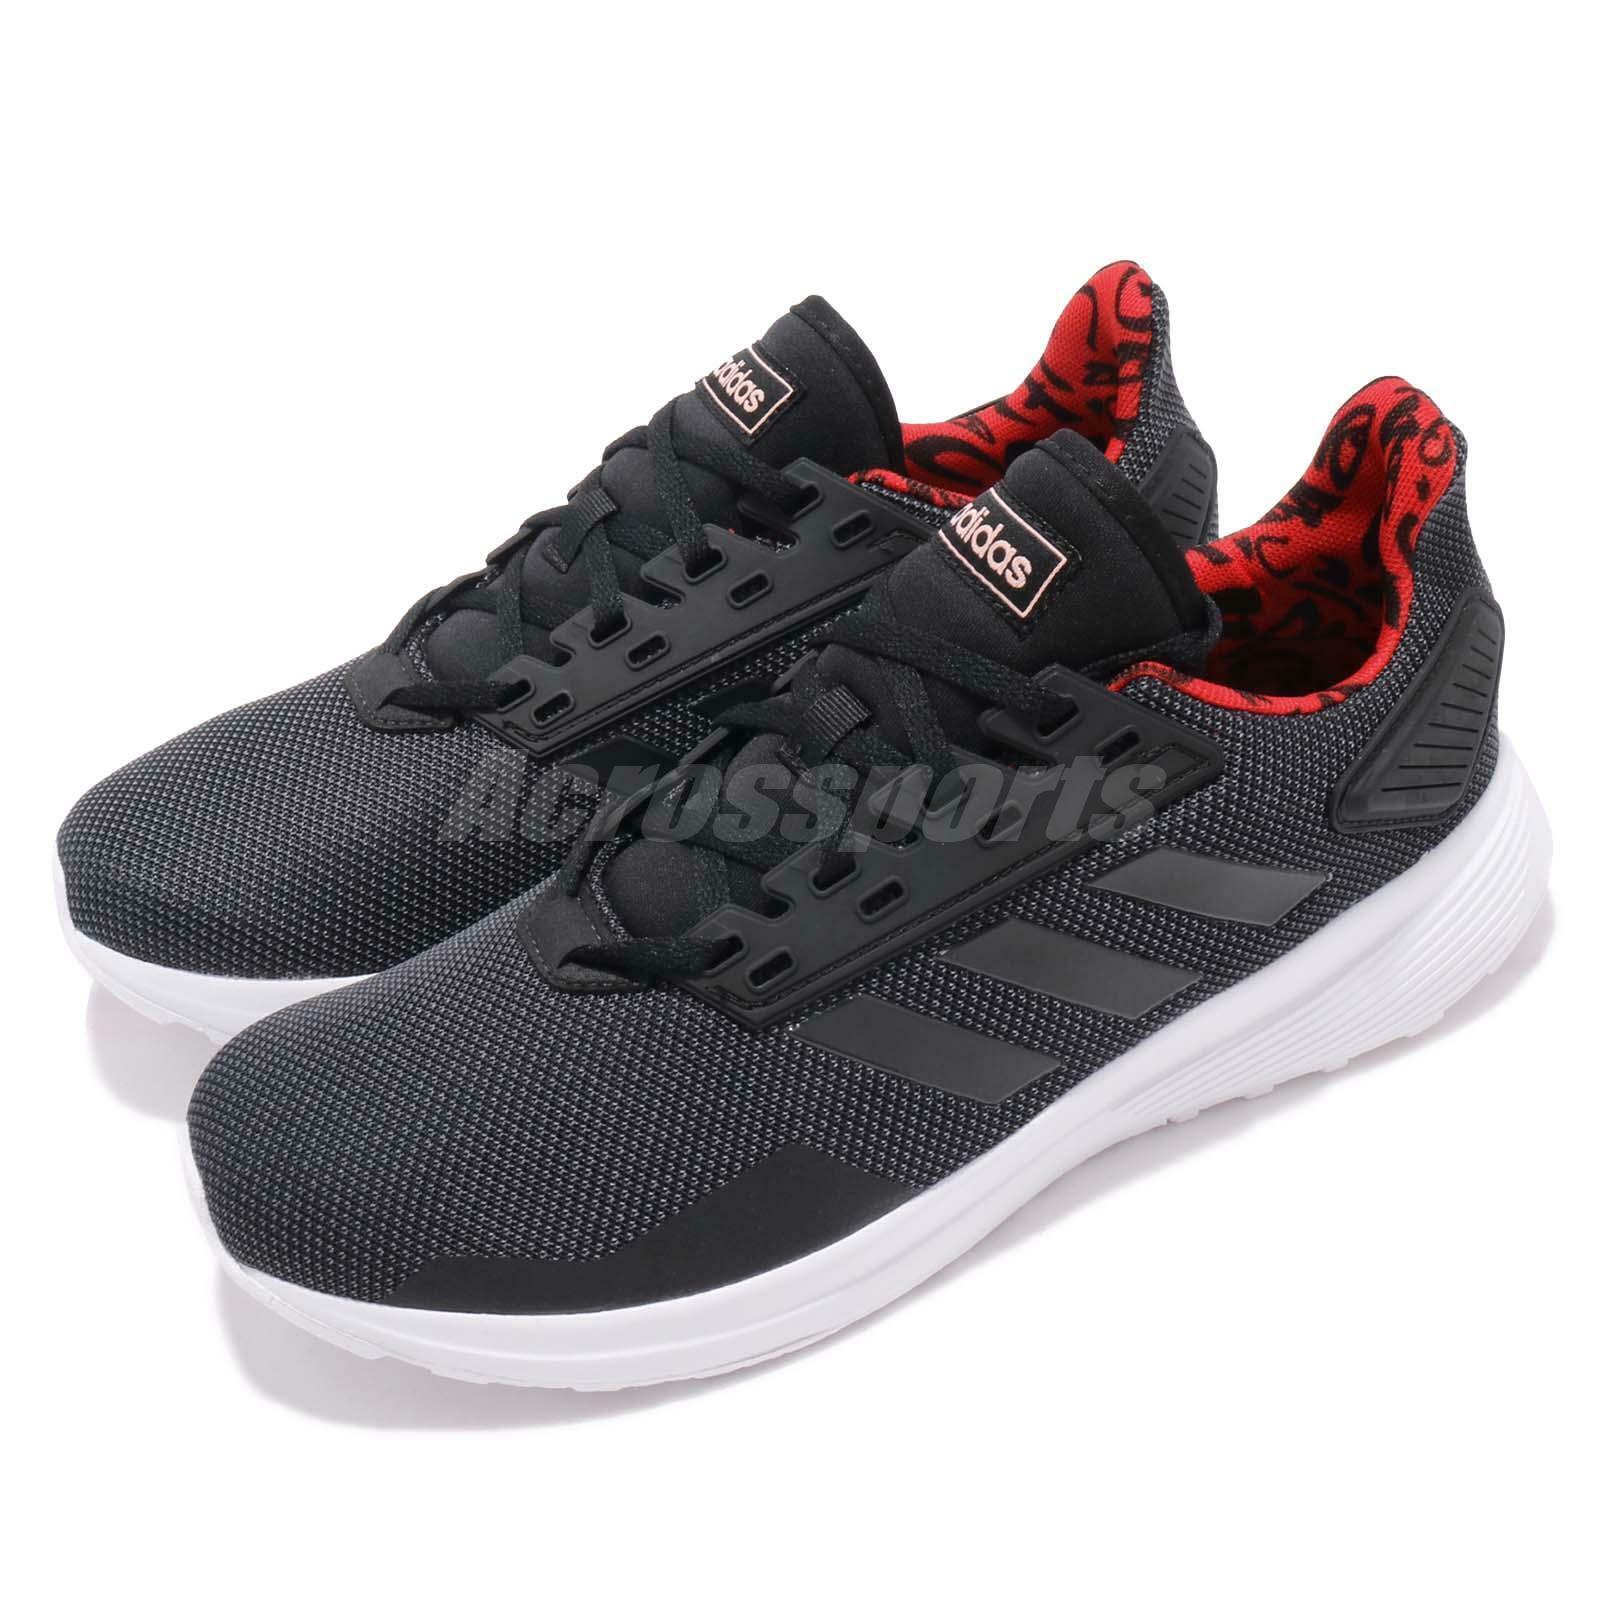 Adidas Duramo 9 negro gris rojo blanco Men Running Casual zapatos zapatillas F37006